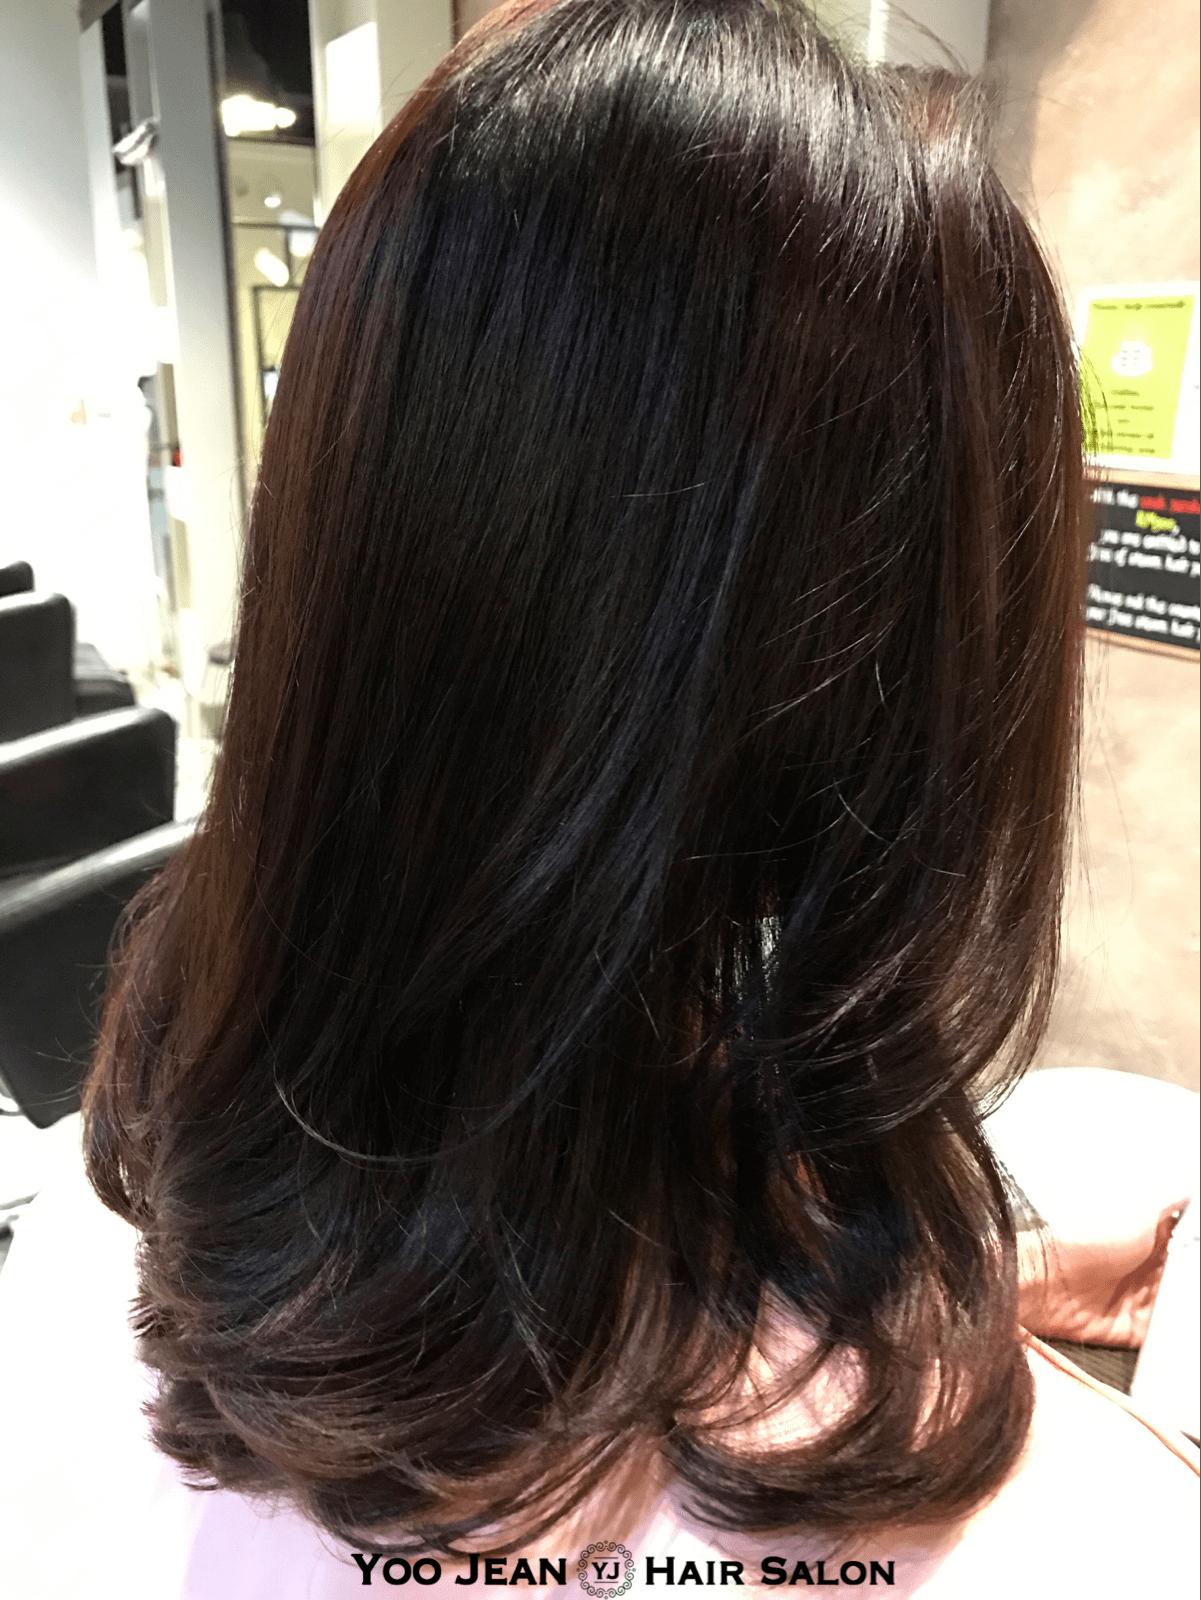 C Curl Hairstyles Korean Hairstyles For Curly Hair Hair Styles